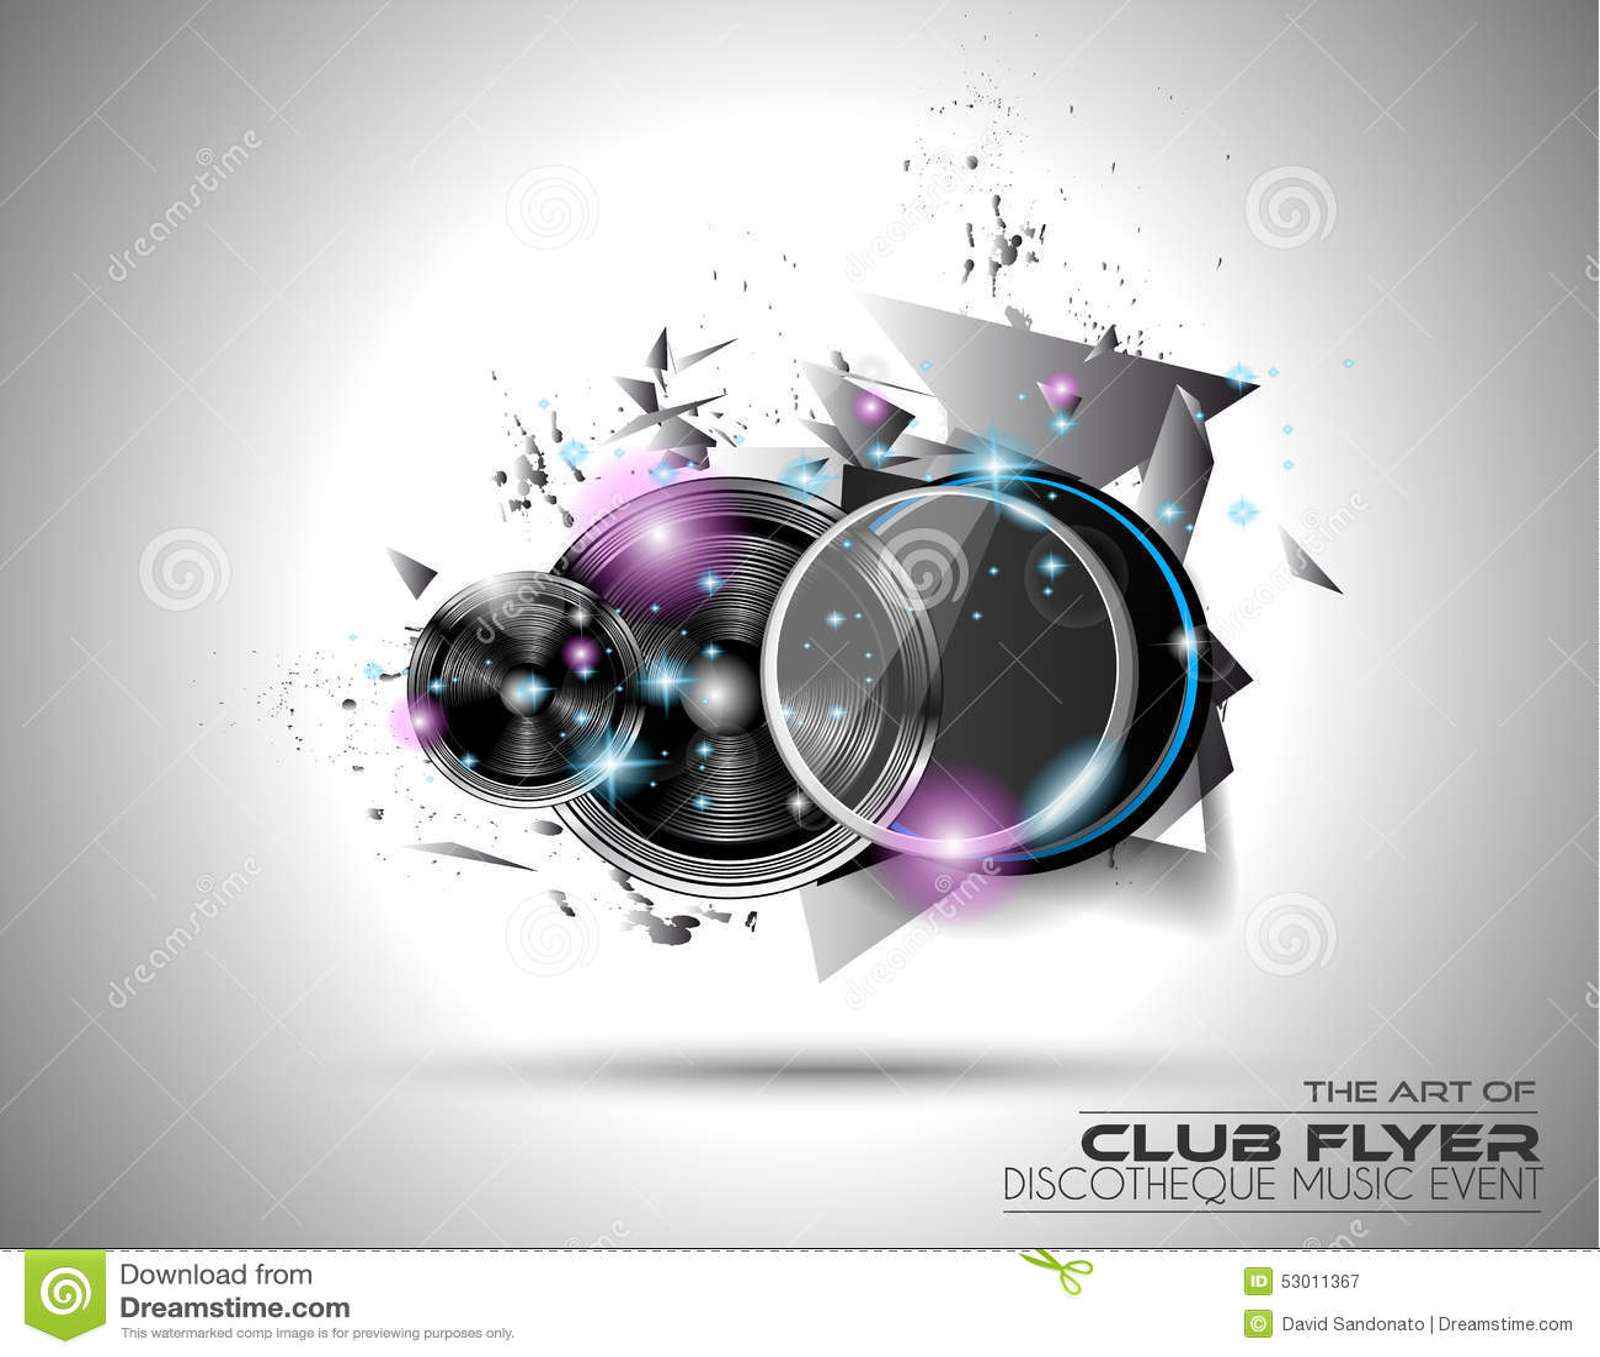 New Music Flyers Design Ideas